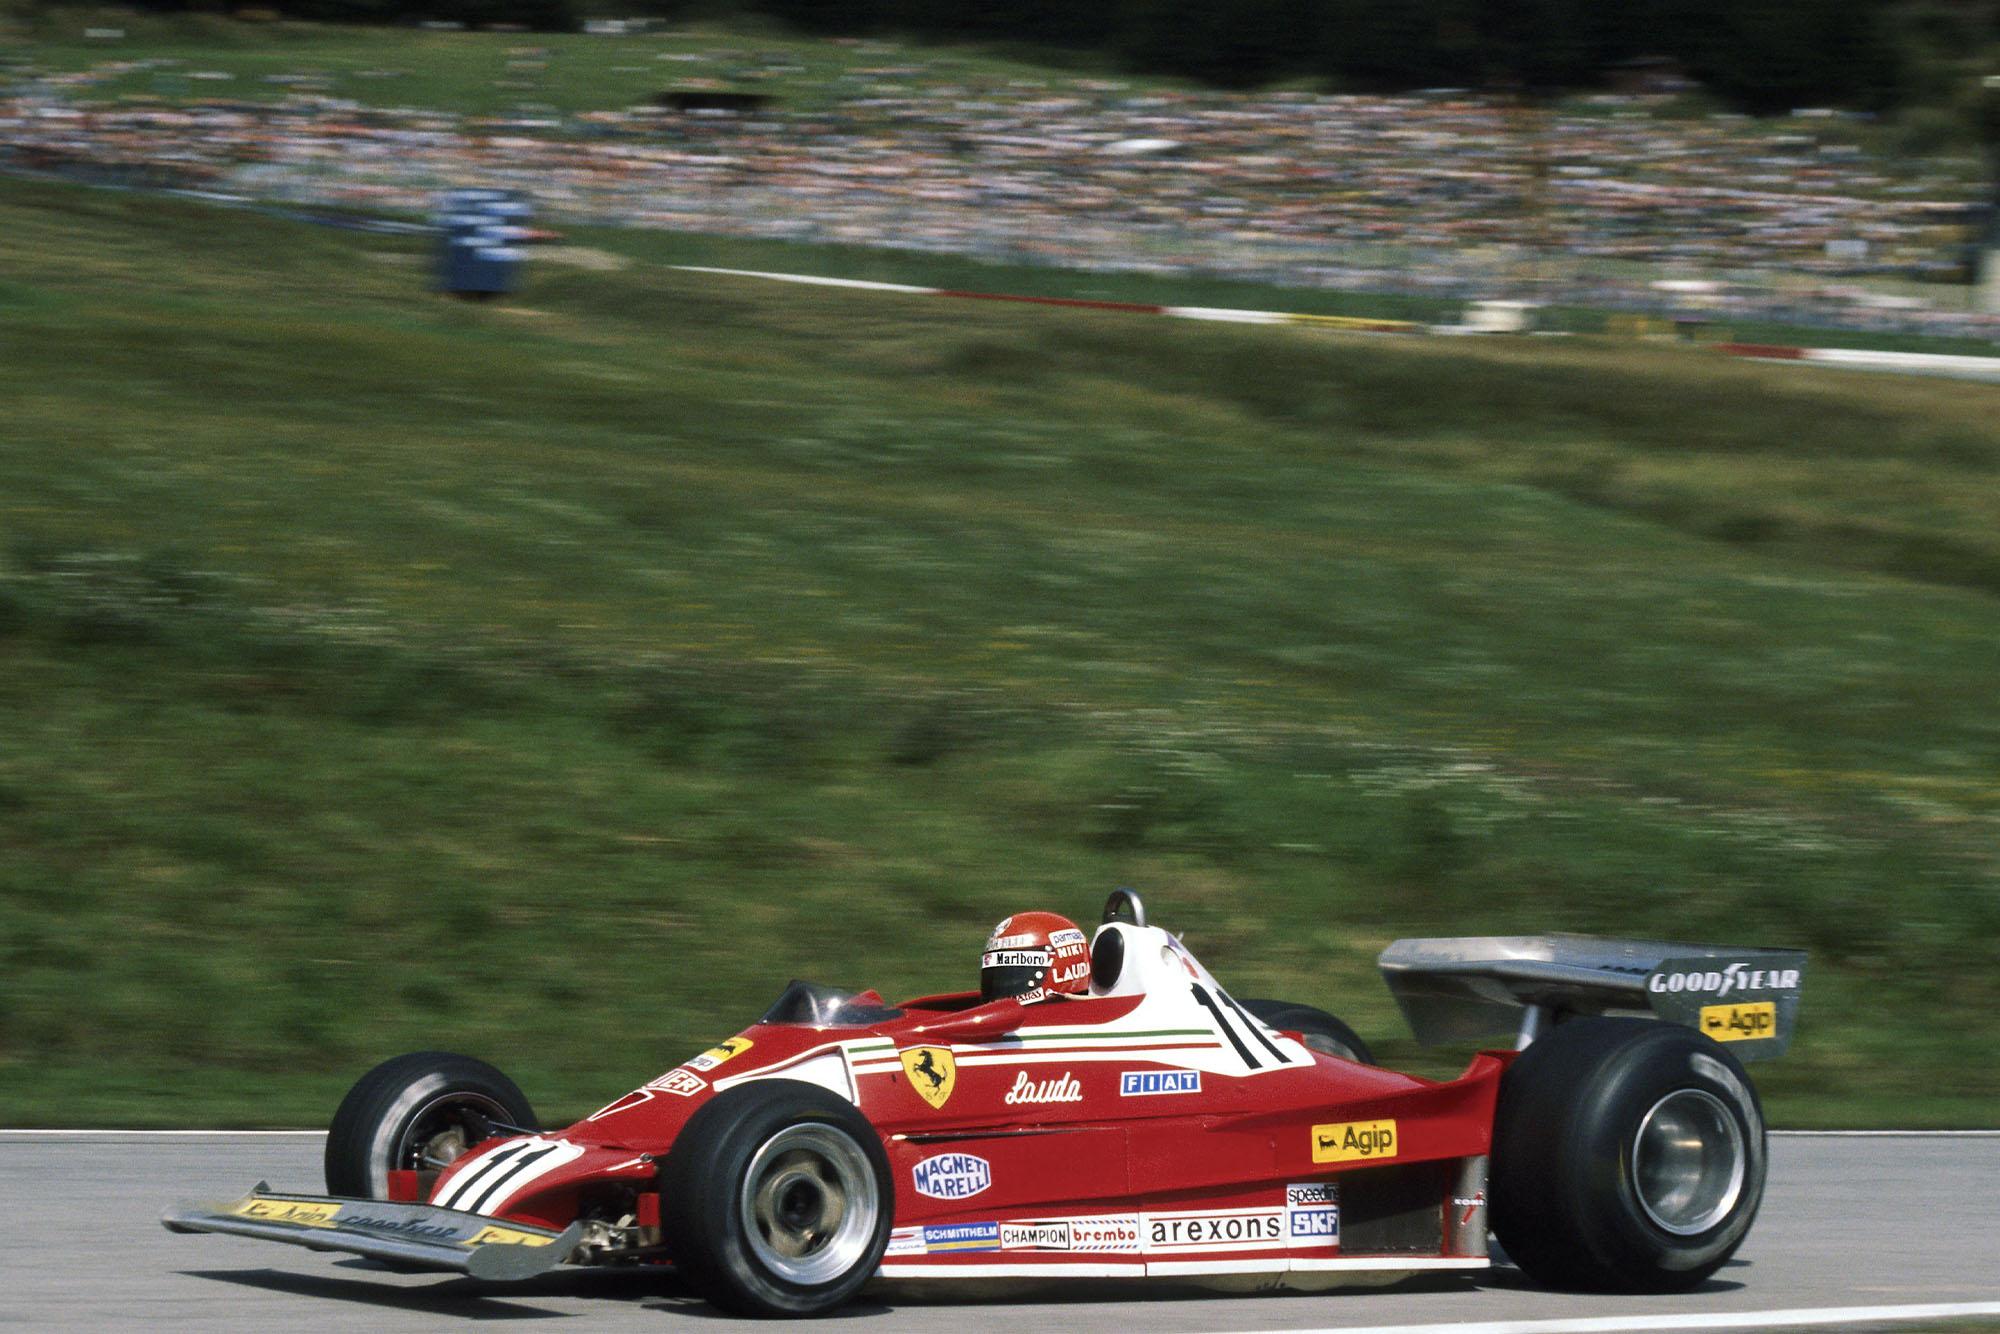 Niki Lauda (Ferrari) at the 1977 Austrian Grand Prix, Österreichring.